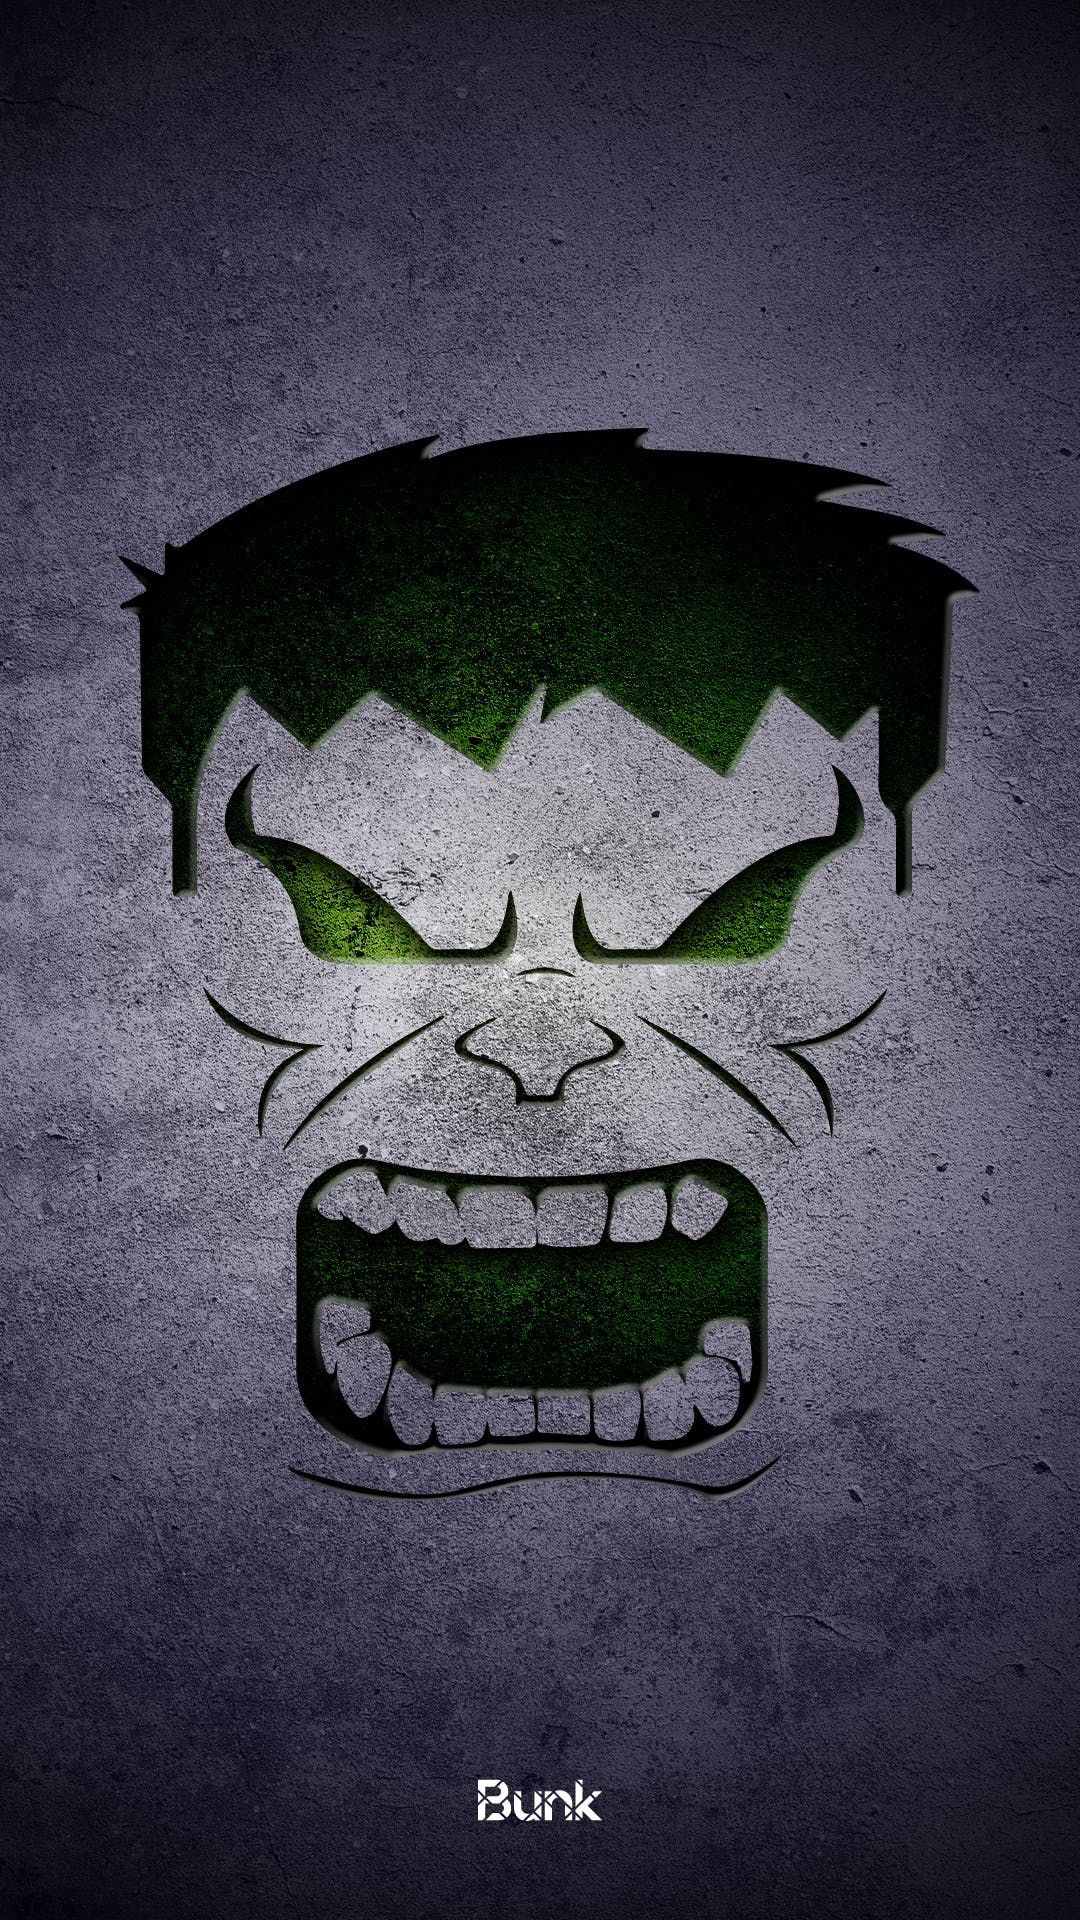 Free stock photo of avengers, AvengersInfinityWar, hulk, infinity war